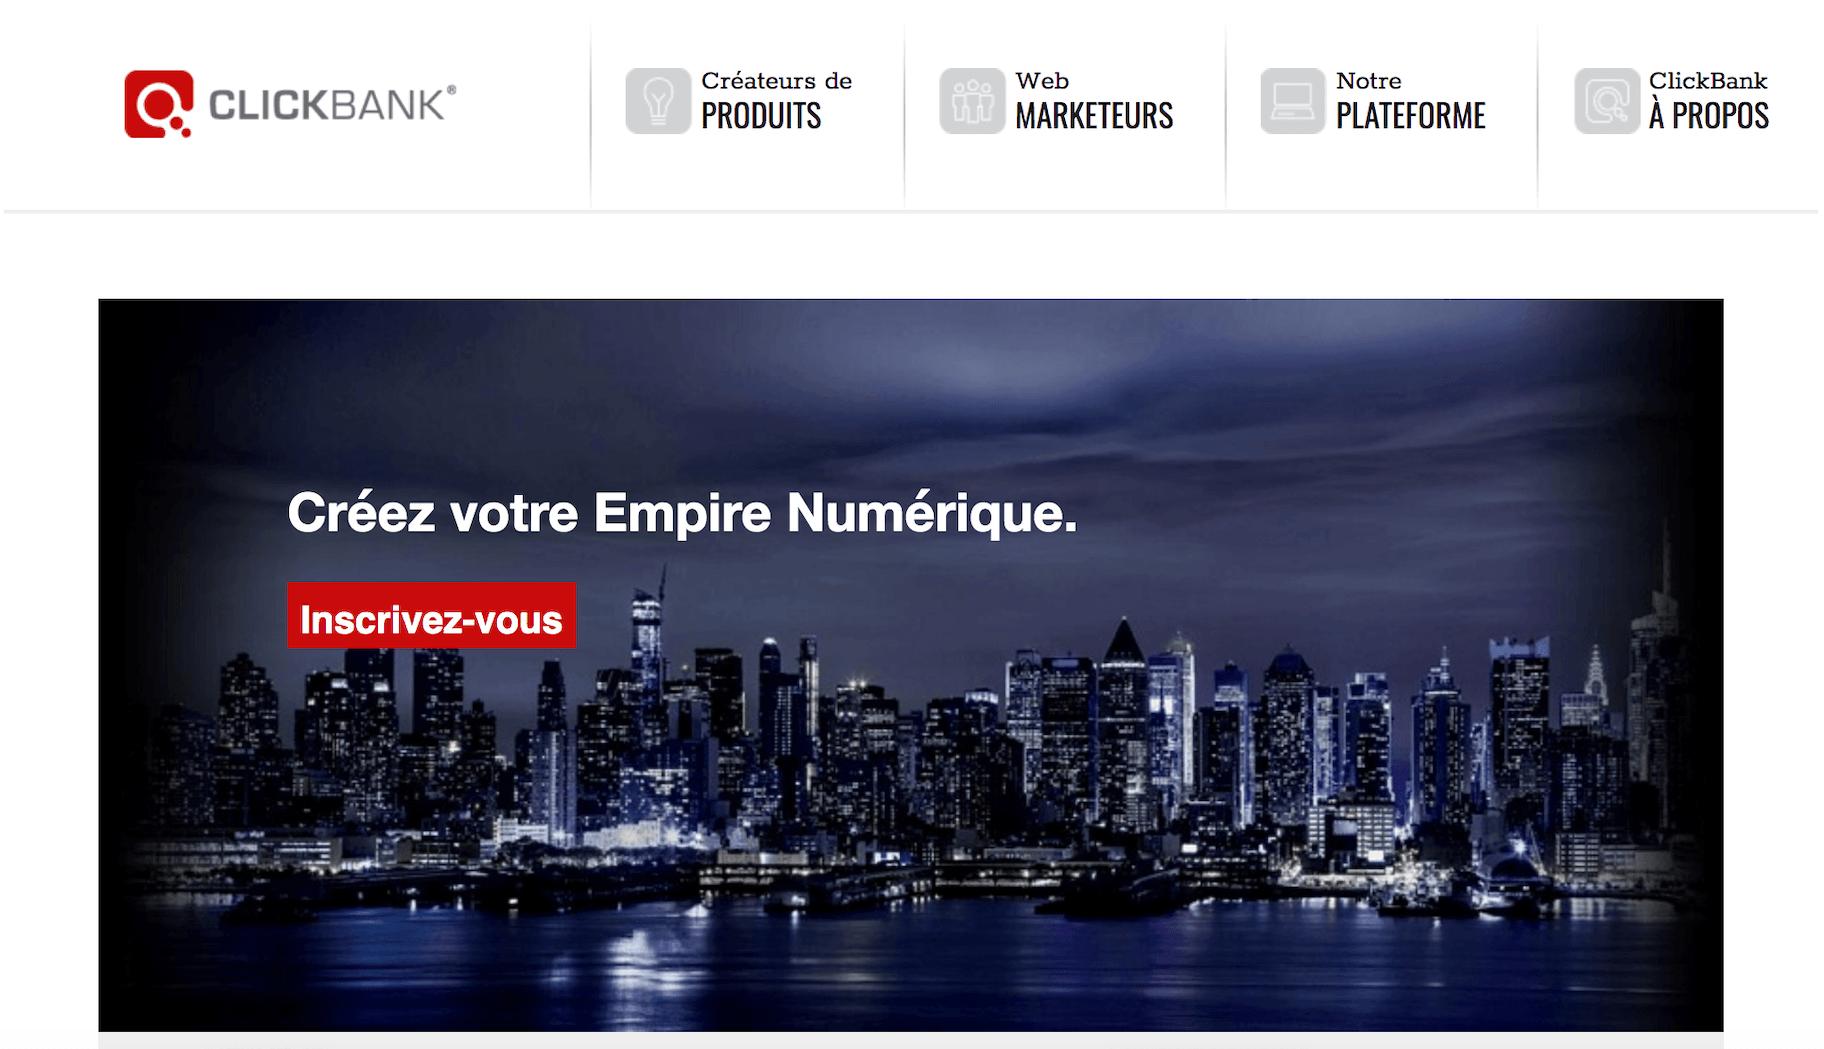 clickbank-affiliation